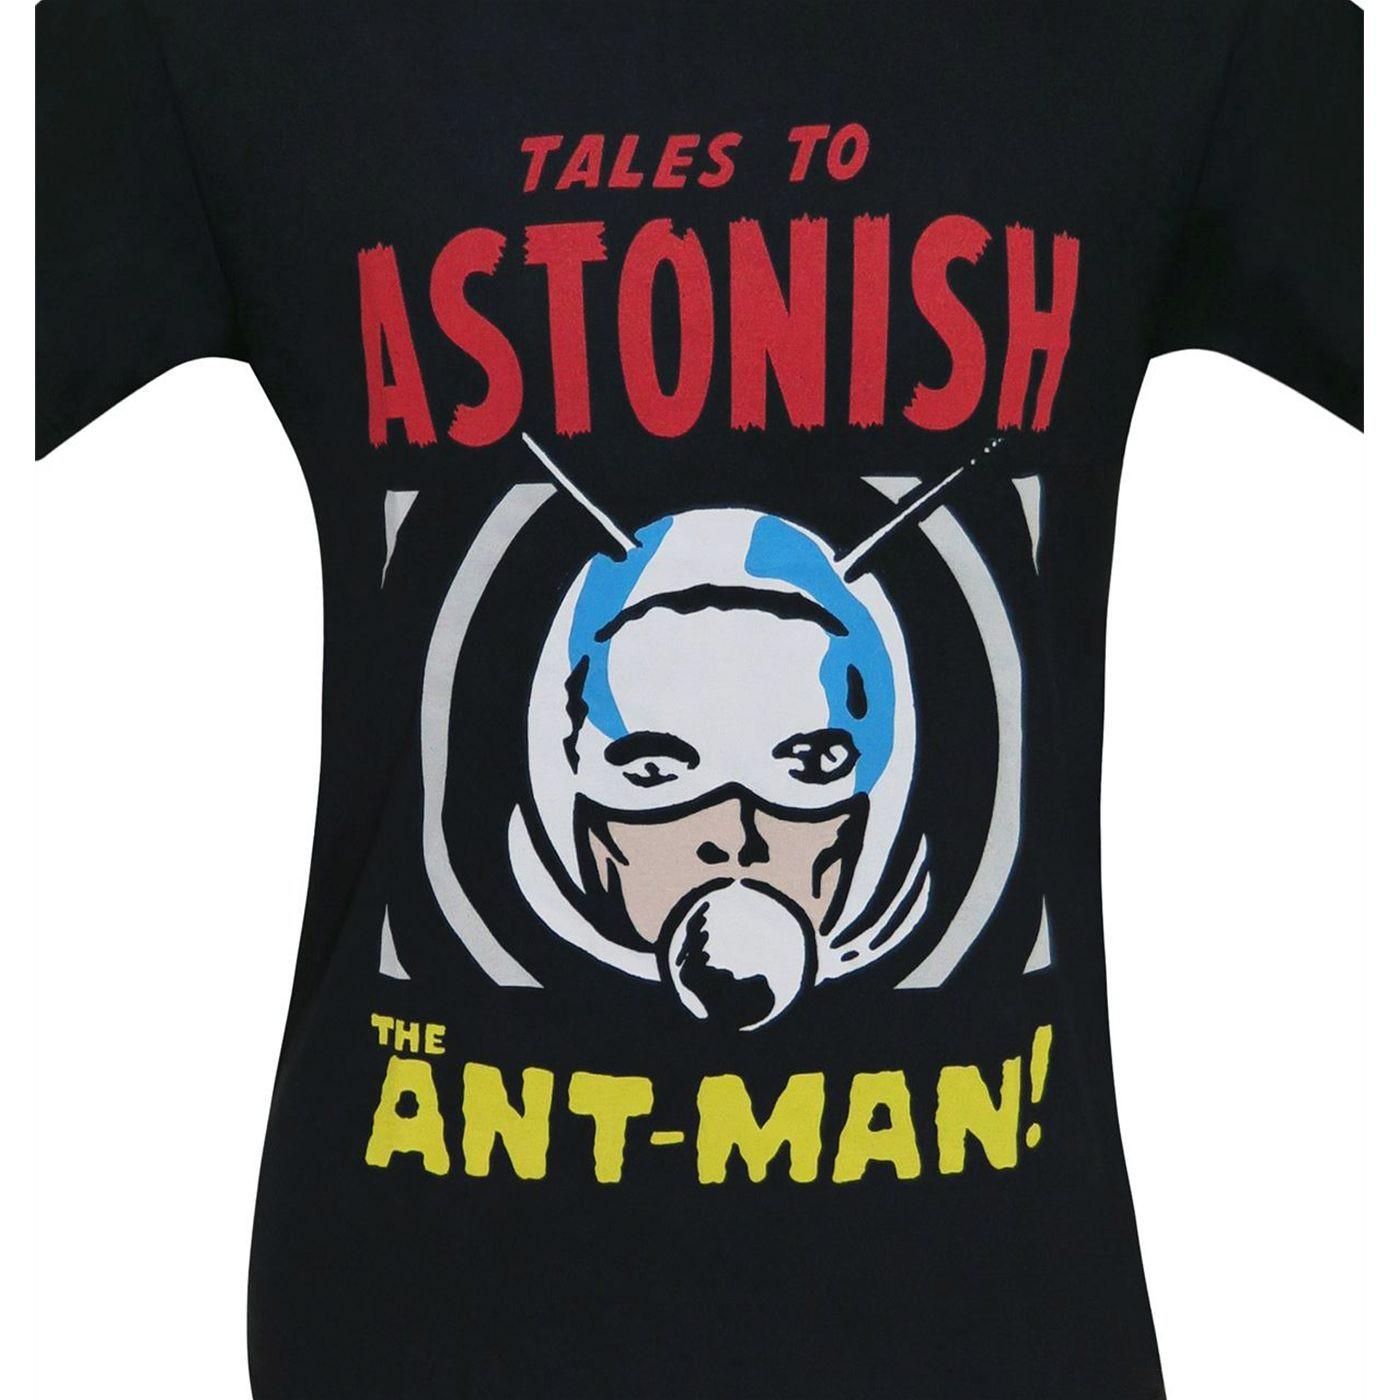 Tales to Astonish Ant-Man Men's T-Shirt